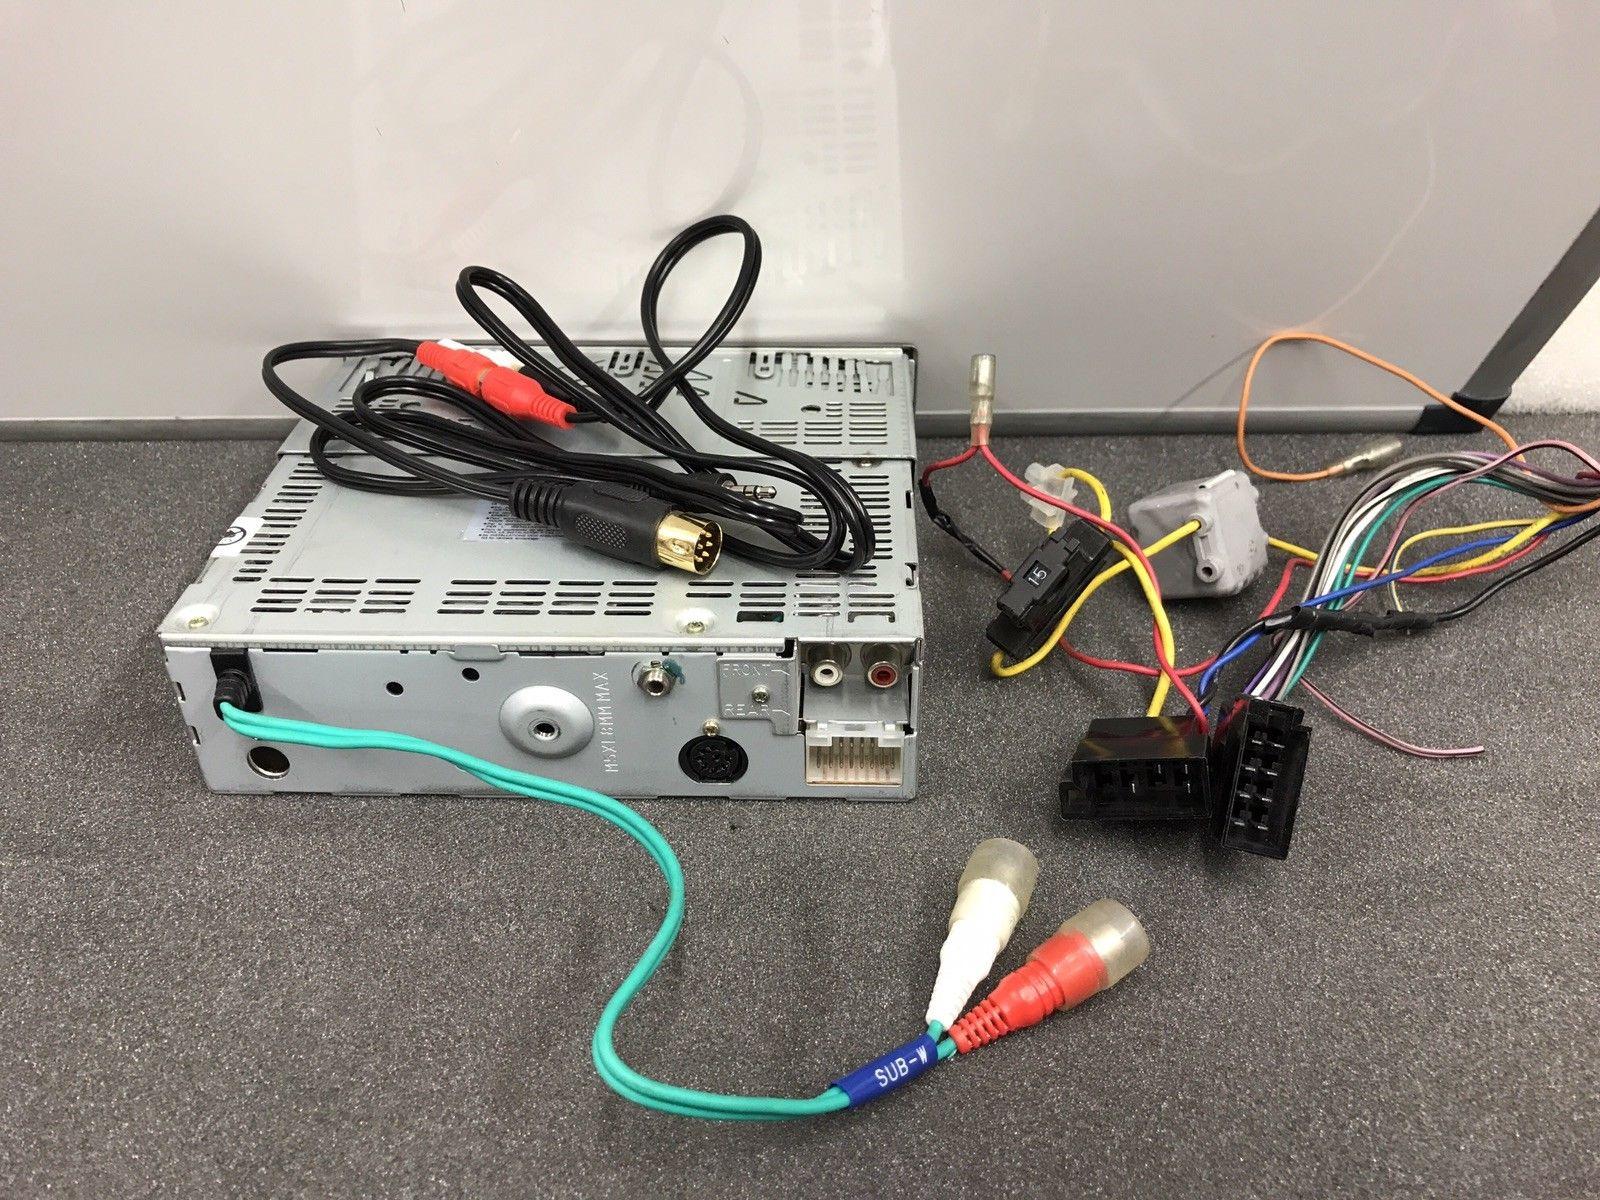 Alpine Car Radio Stereo Cd Player Model Cdm-7874rb Retro With Rear Aux In Lead